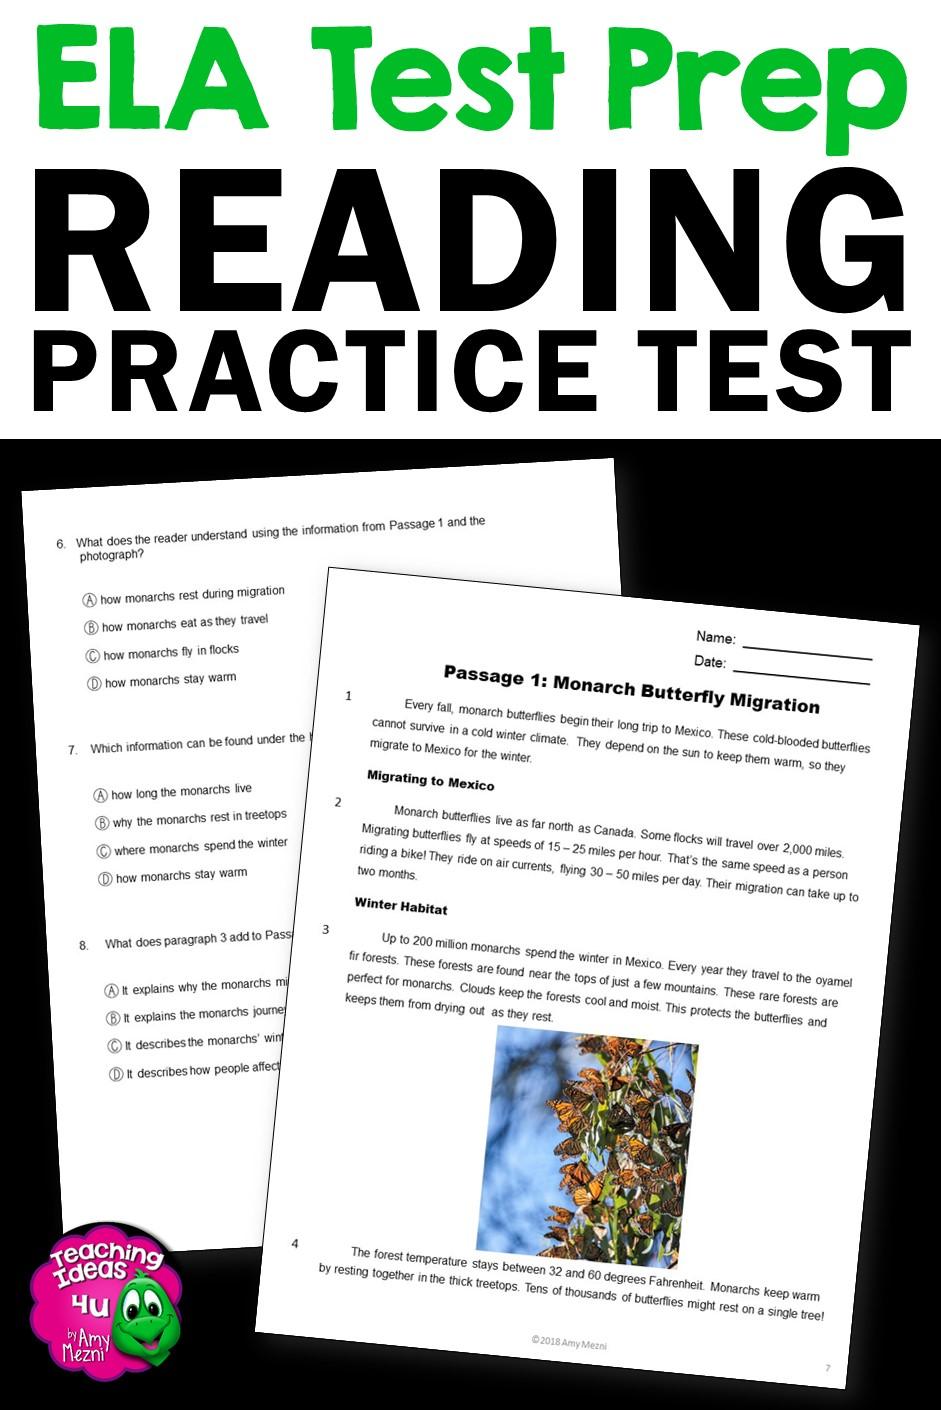 5 fun ways to use test prep in the classroom teachingideas4u by